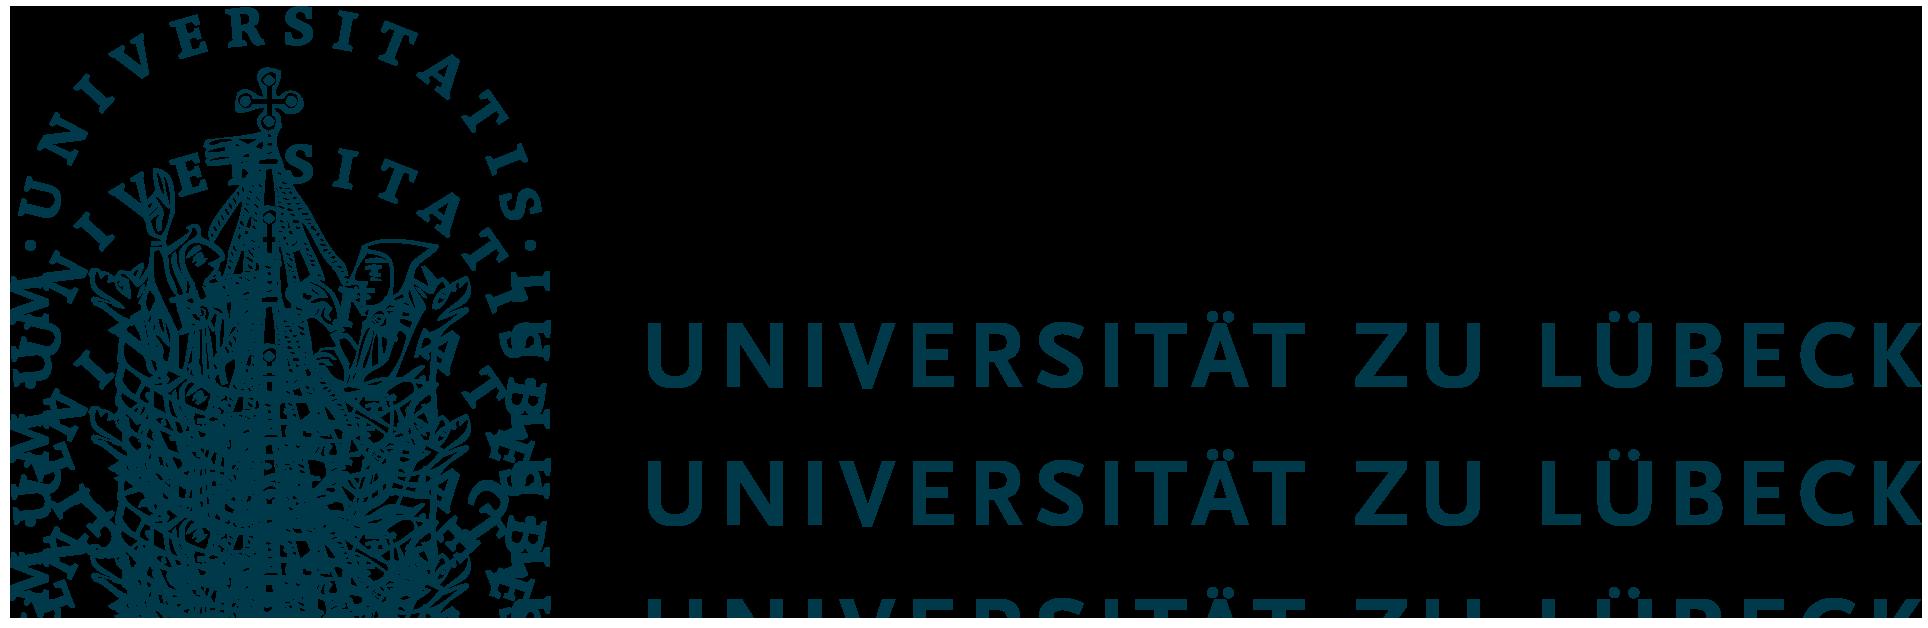 Dezernatsleitung (m/w/d) - Universität zu Lübeck - logo